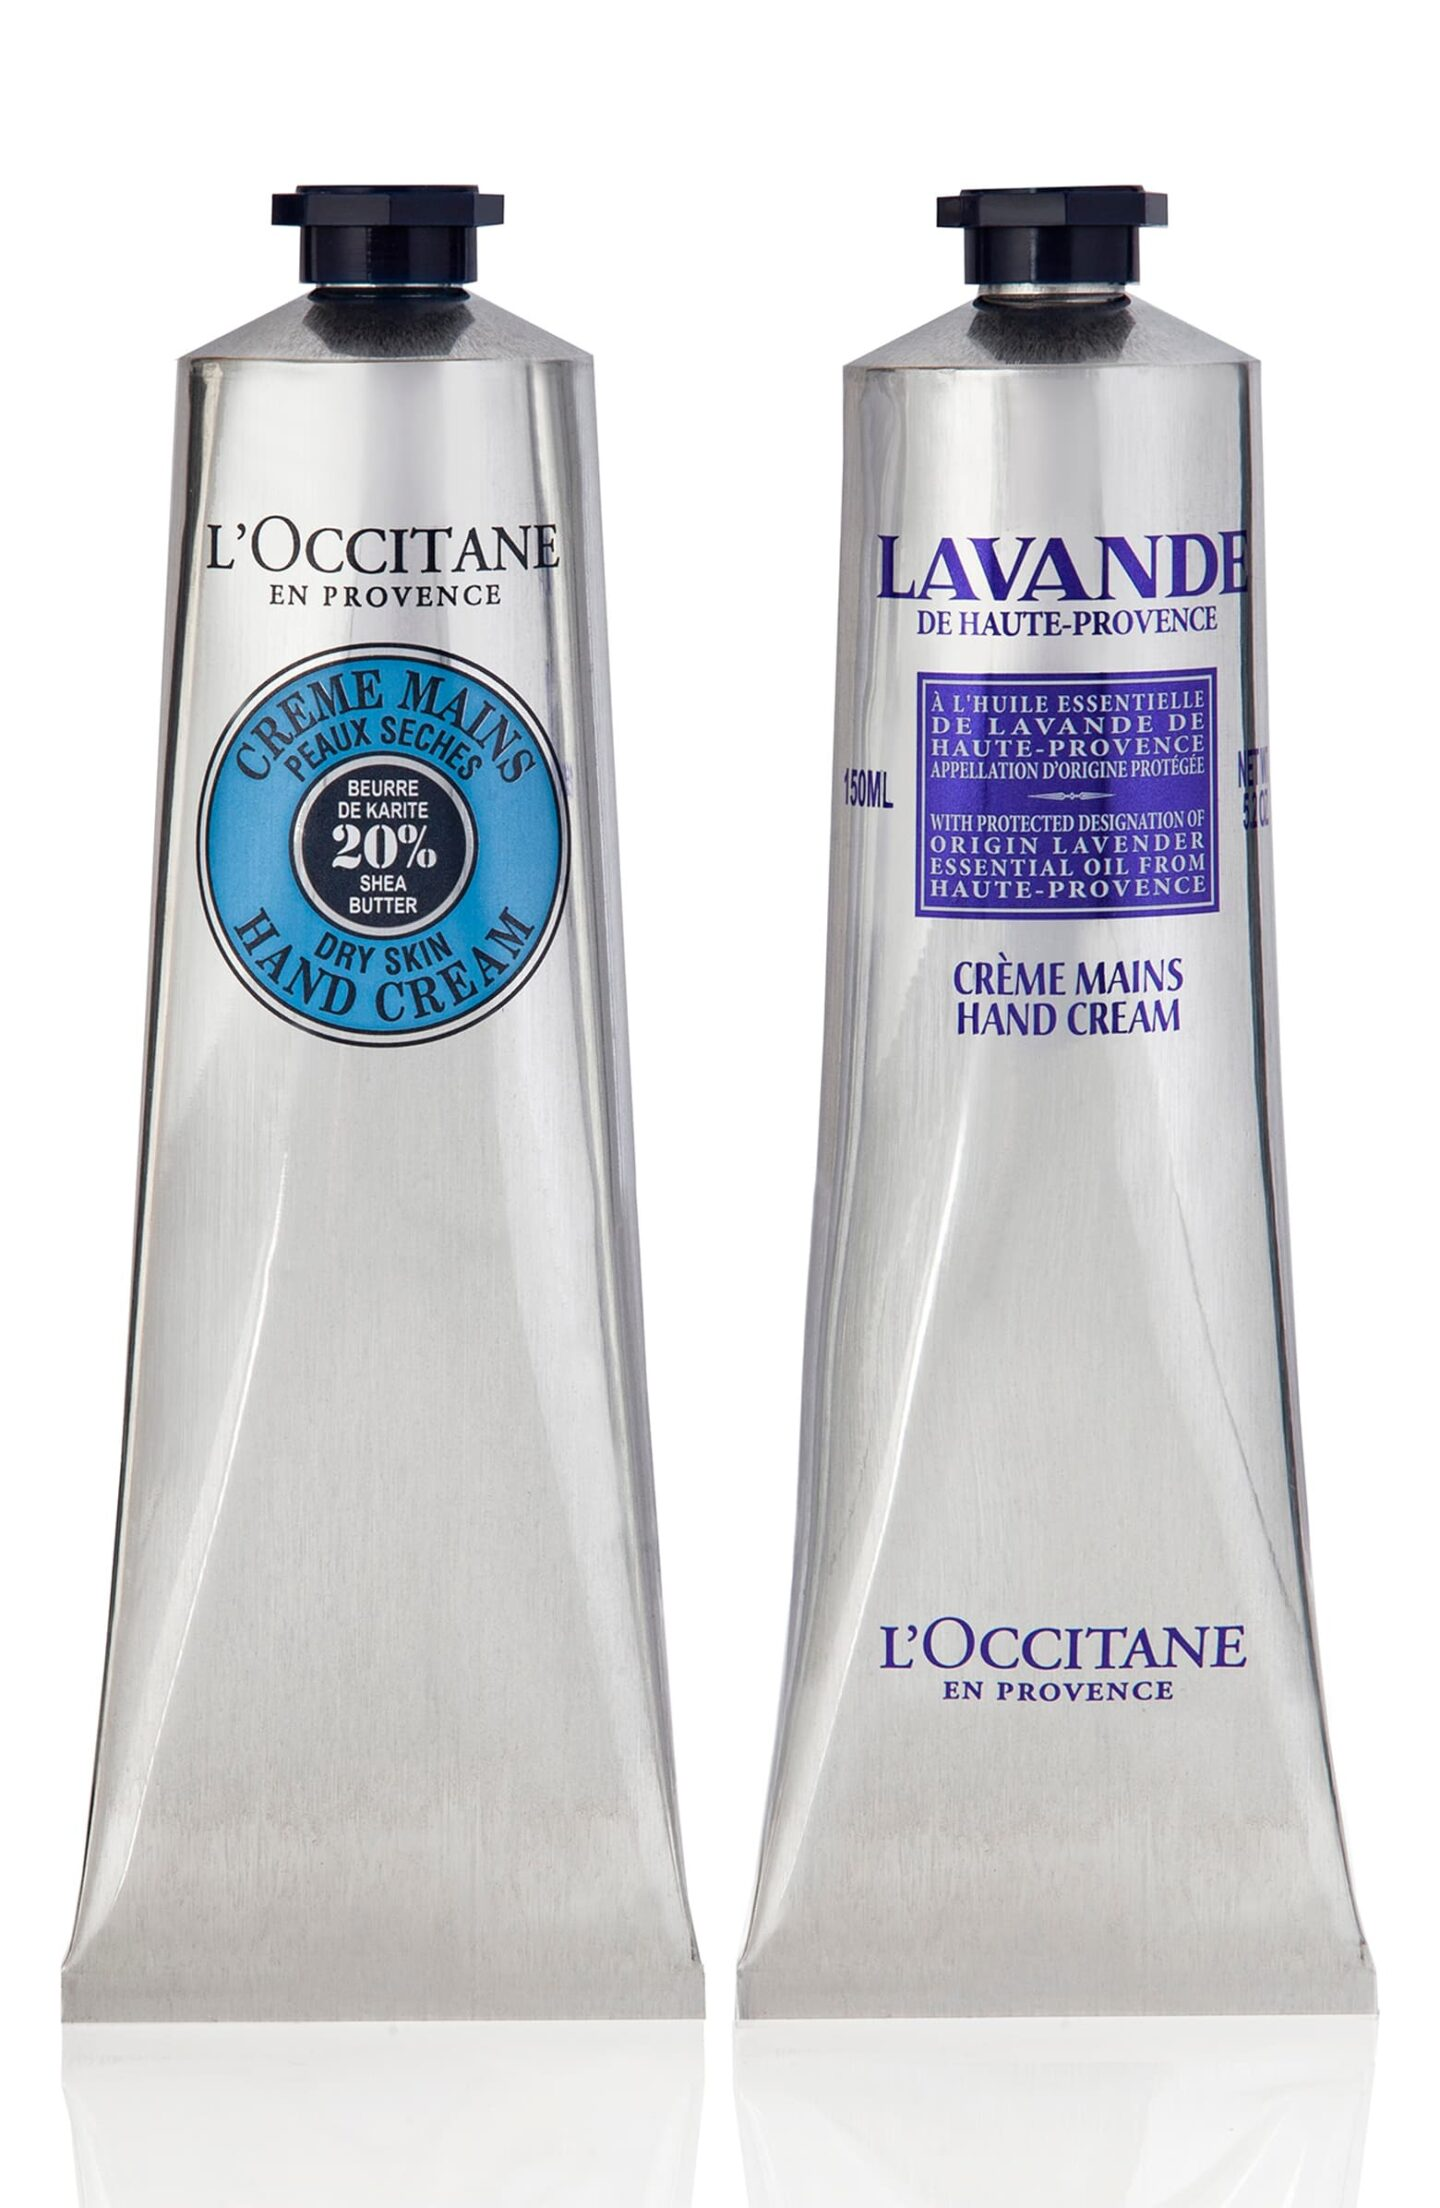 loccitane hand cream - 2020 nordstrom anniversary sale